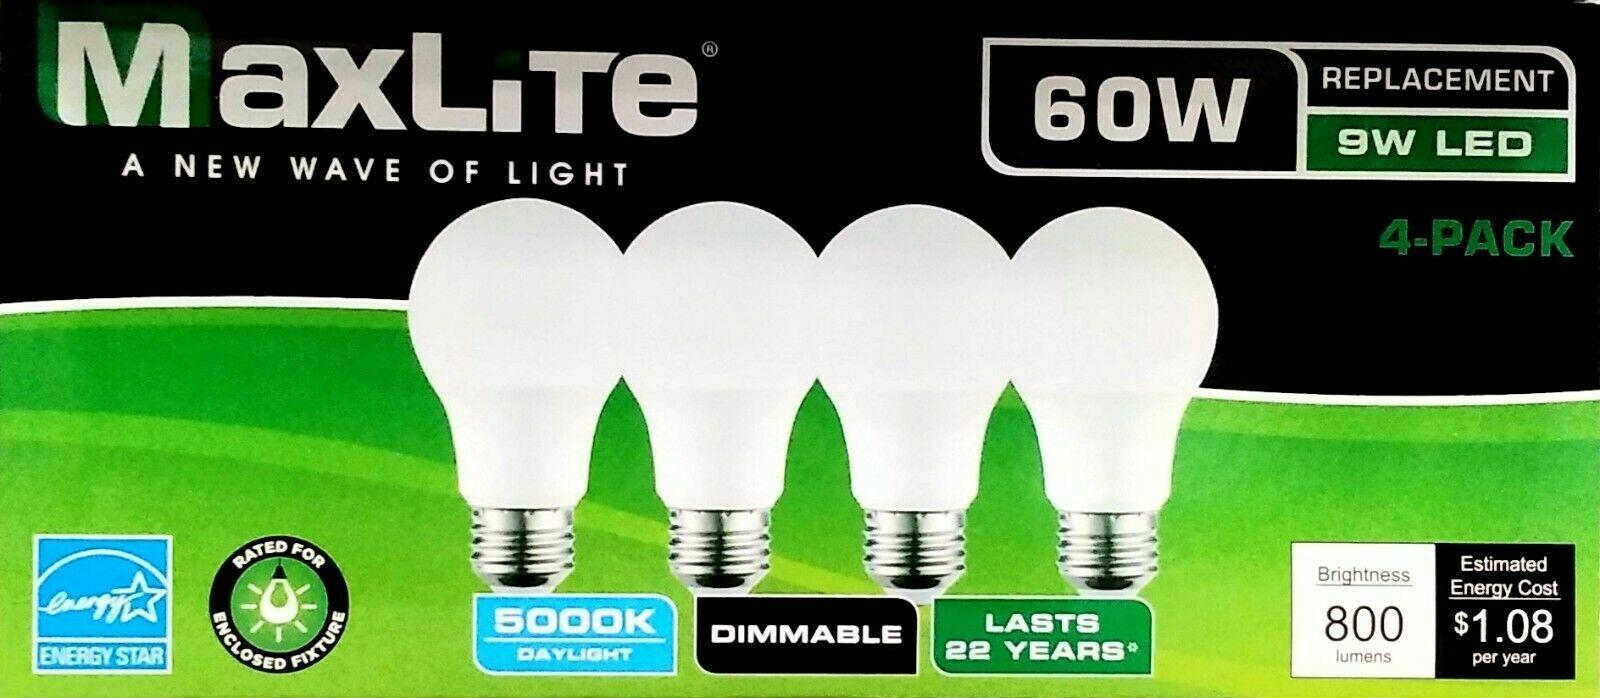 4-PACK DAYLIGHT 9W LED LIGHT BULBS 60W EQUIVALENT A19 800 LU